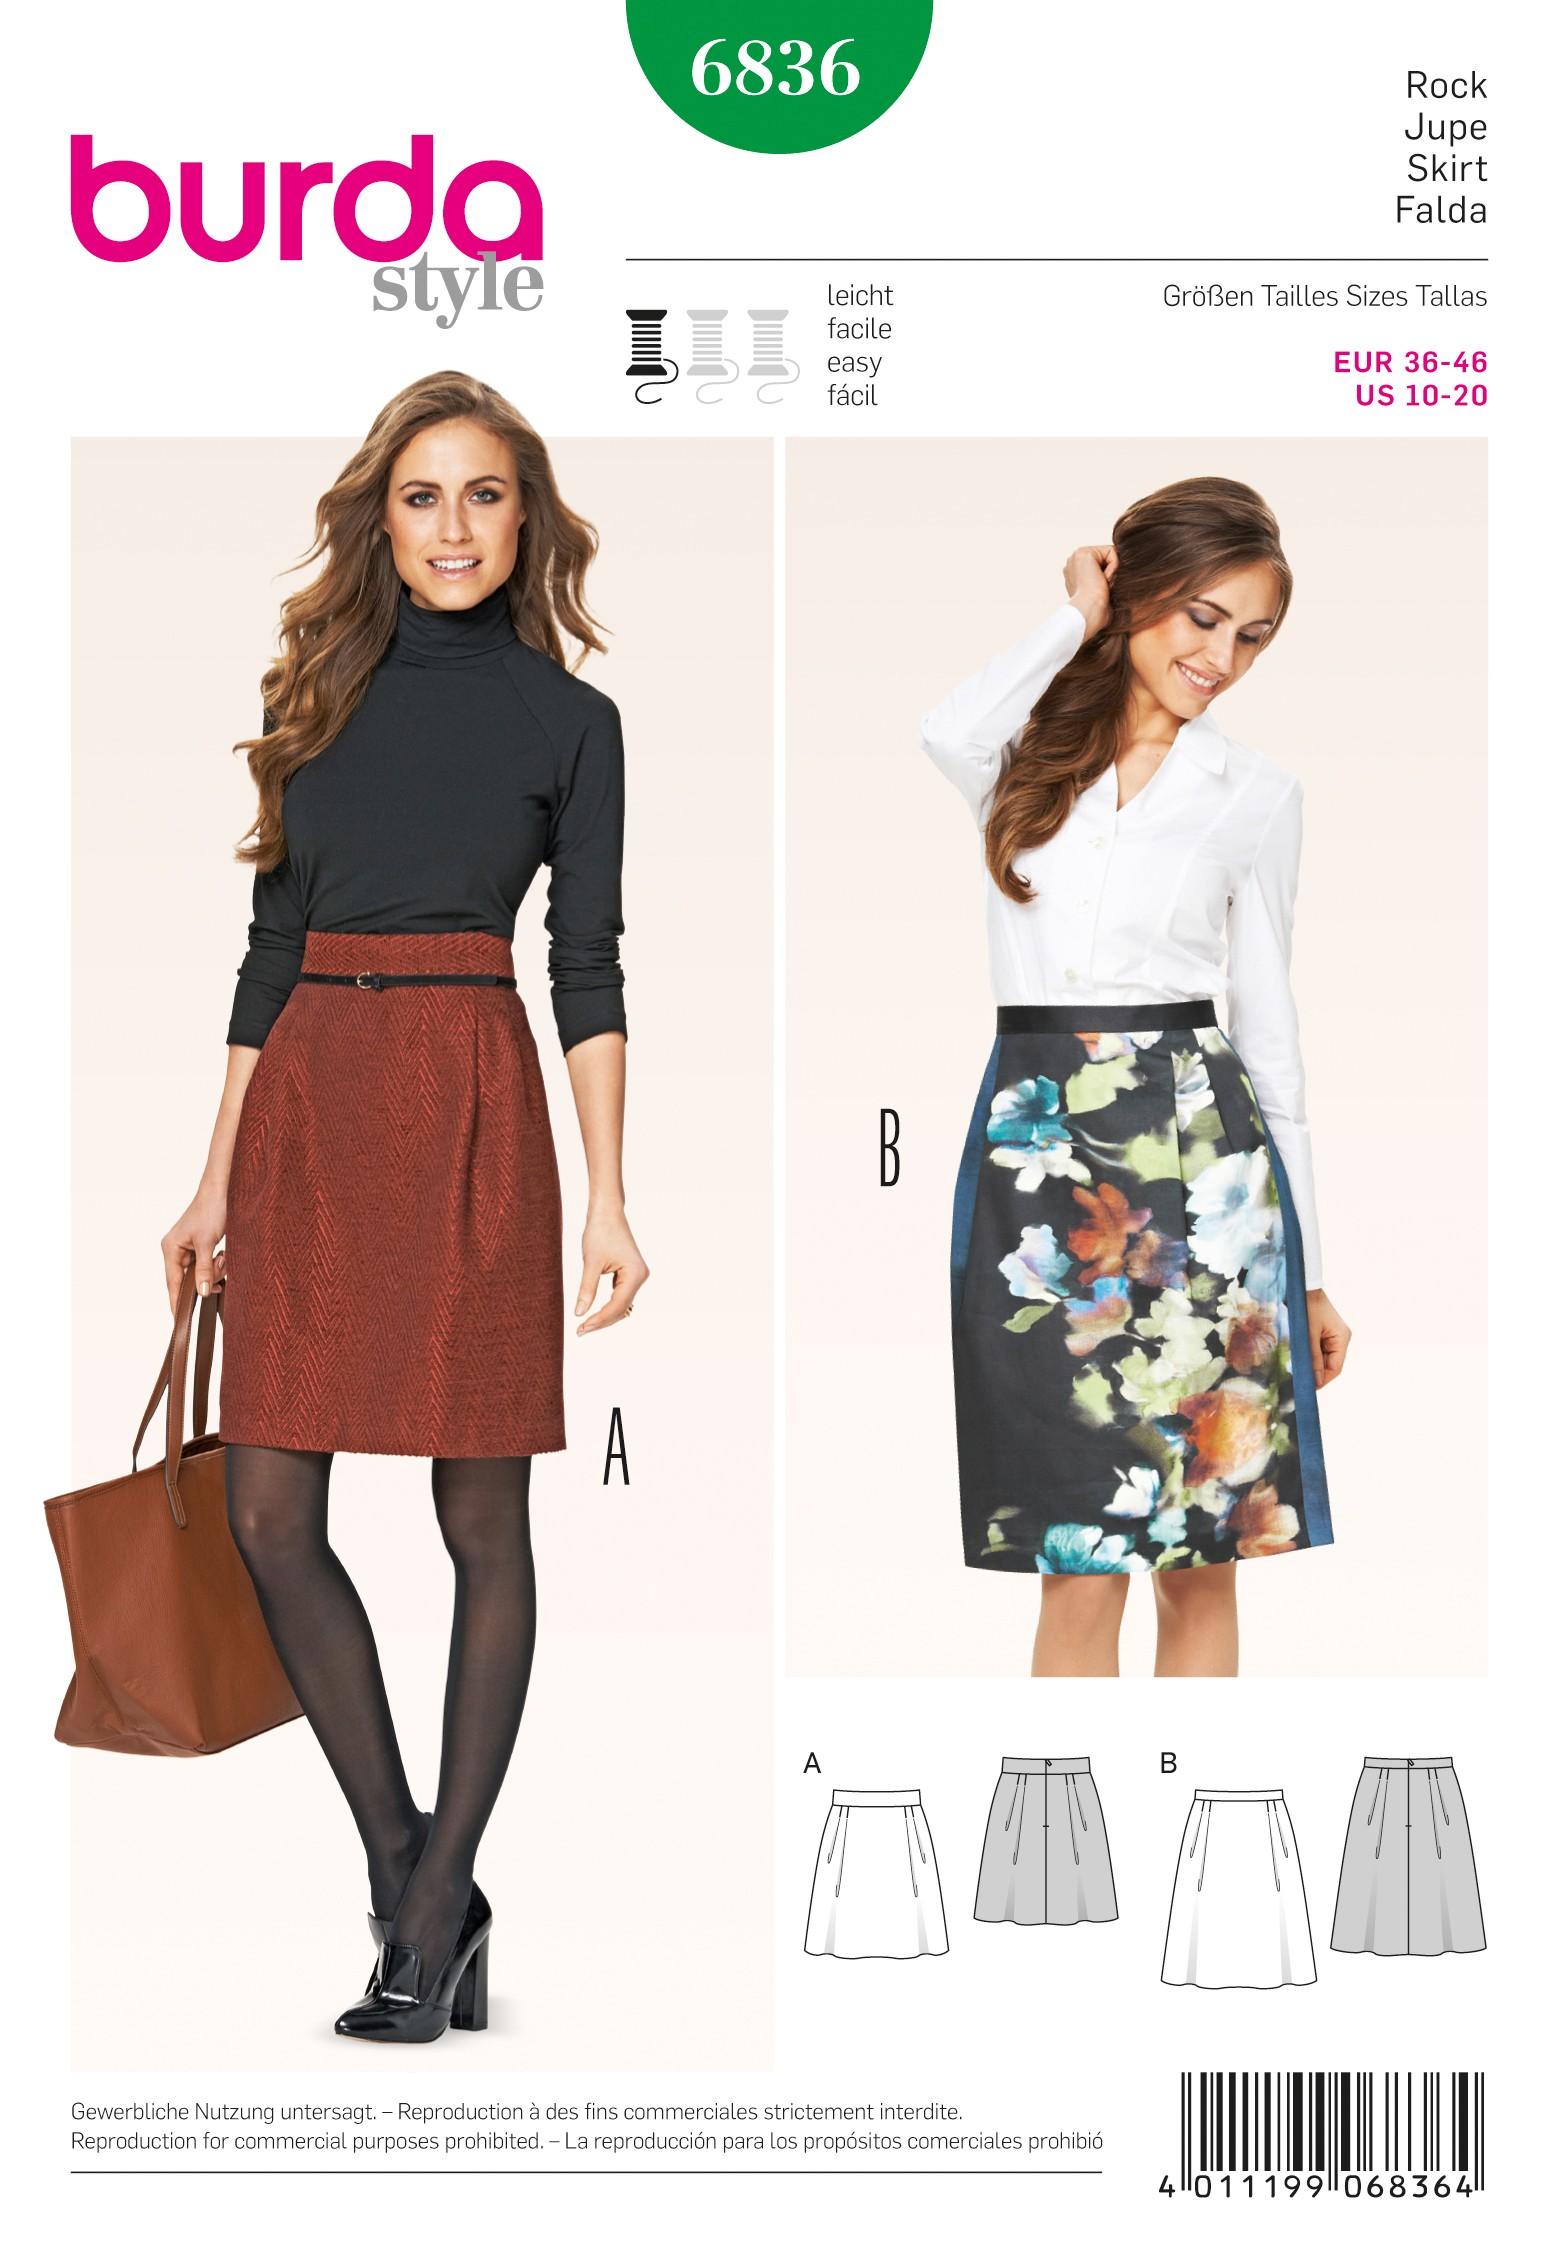 Burda Style Misses' Midi Length Formal Office Skirt Sewing Pattern 6836